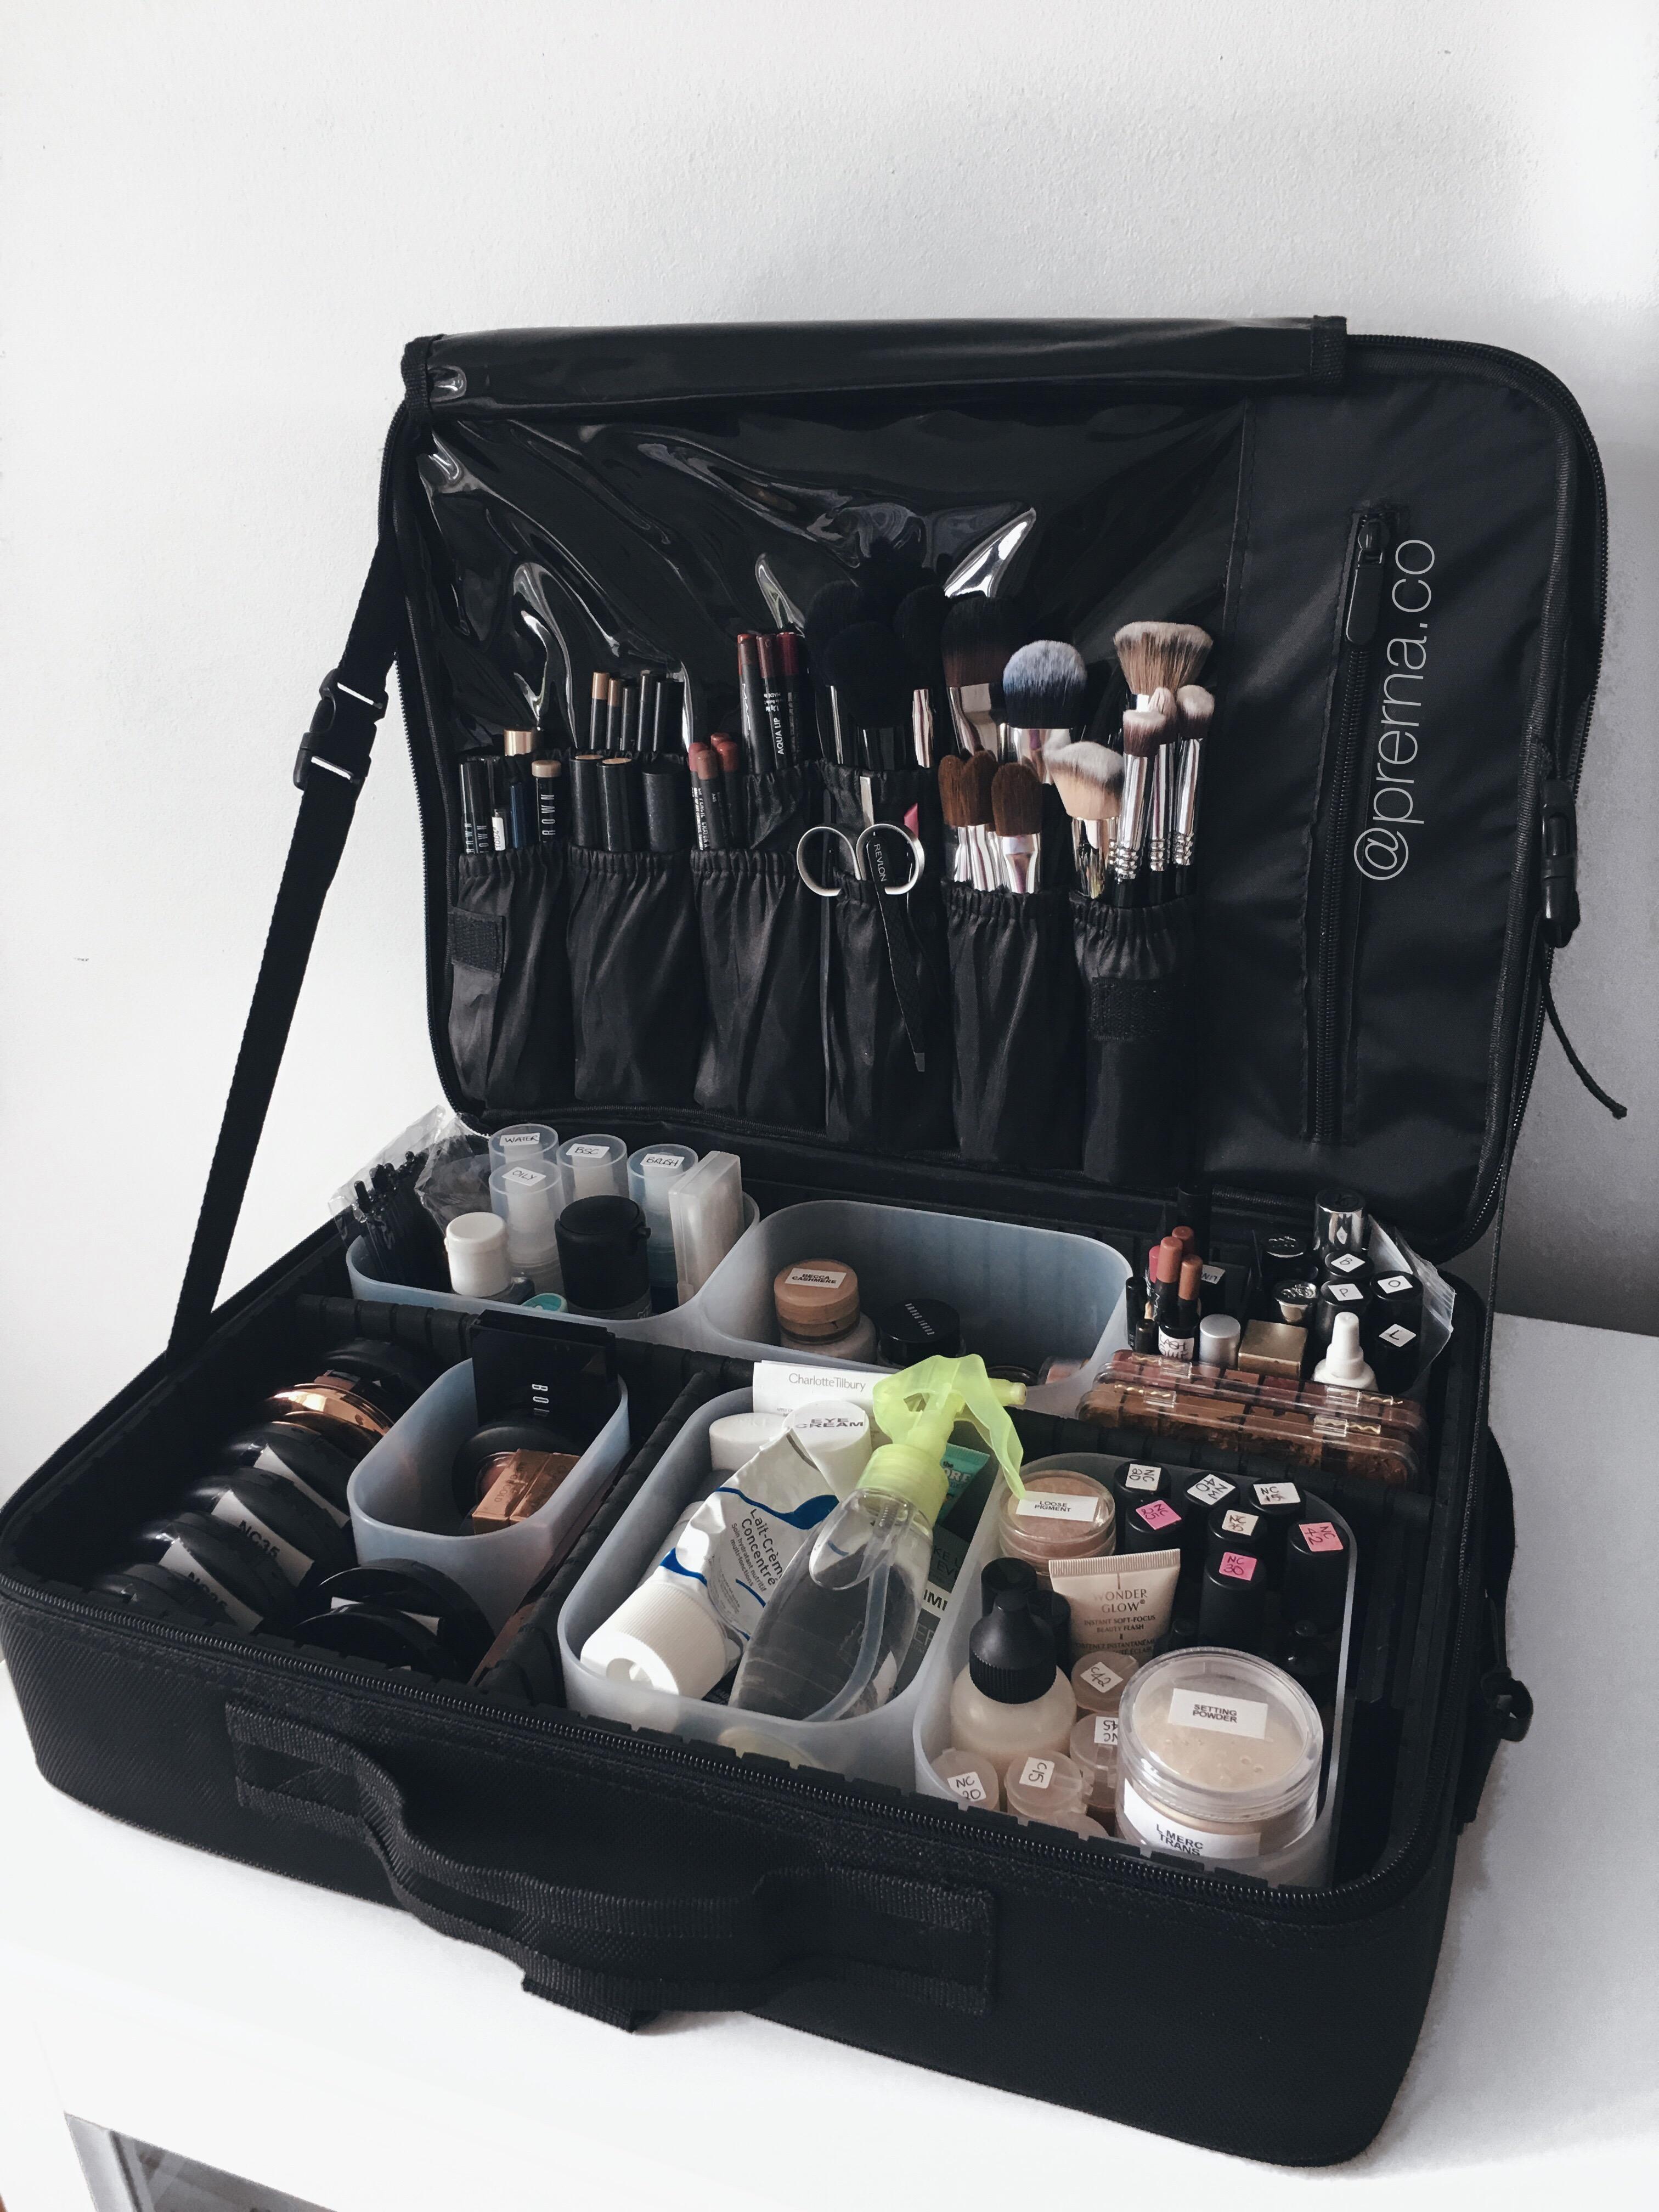 Professional Makeup Kit Downsizing